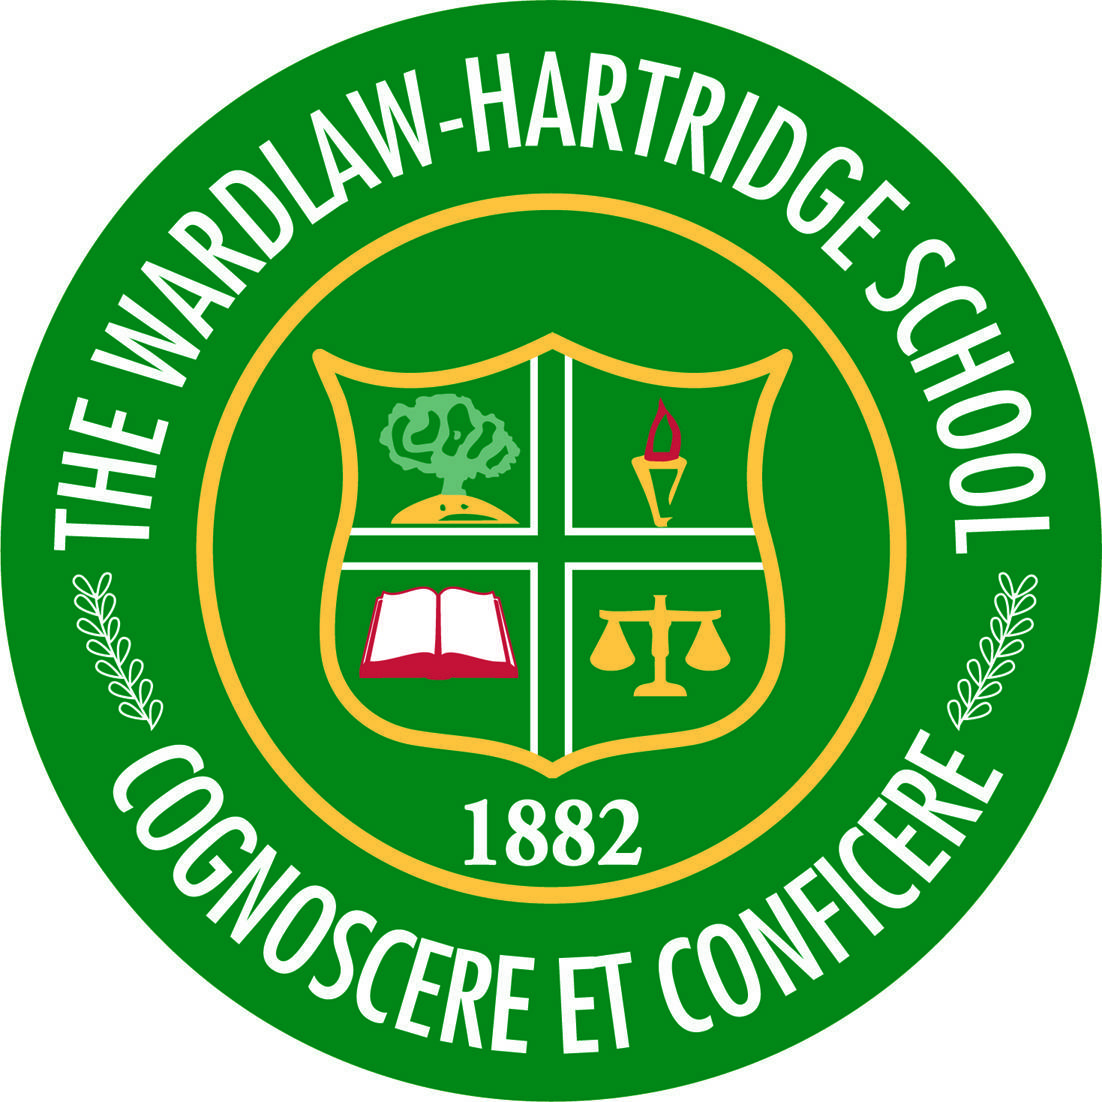 c969384b69f8d99296e3_Wardlaw_Hartridge_logo.jpg